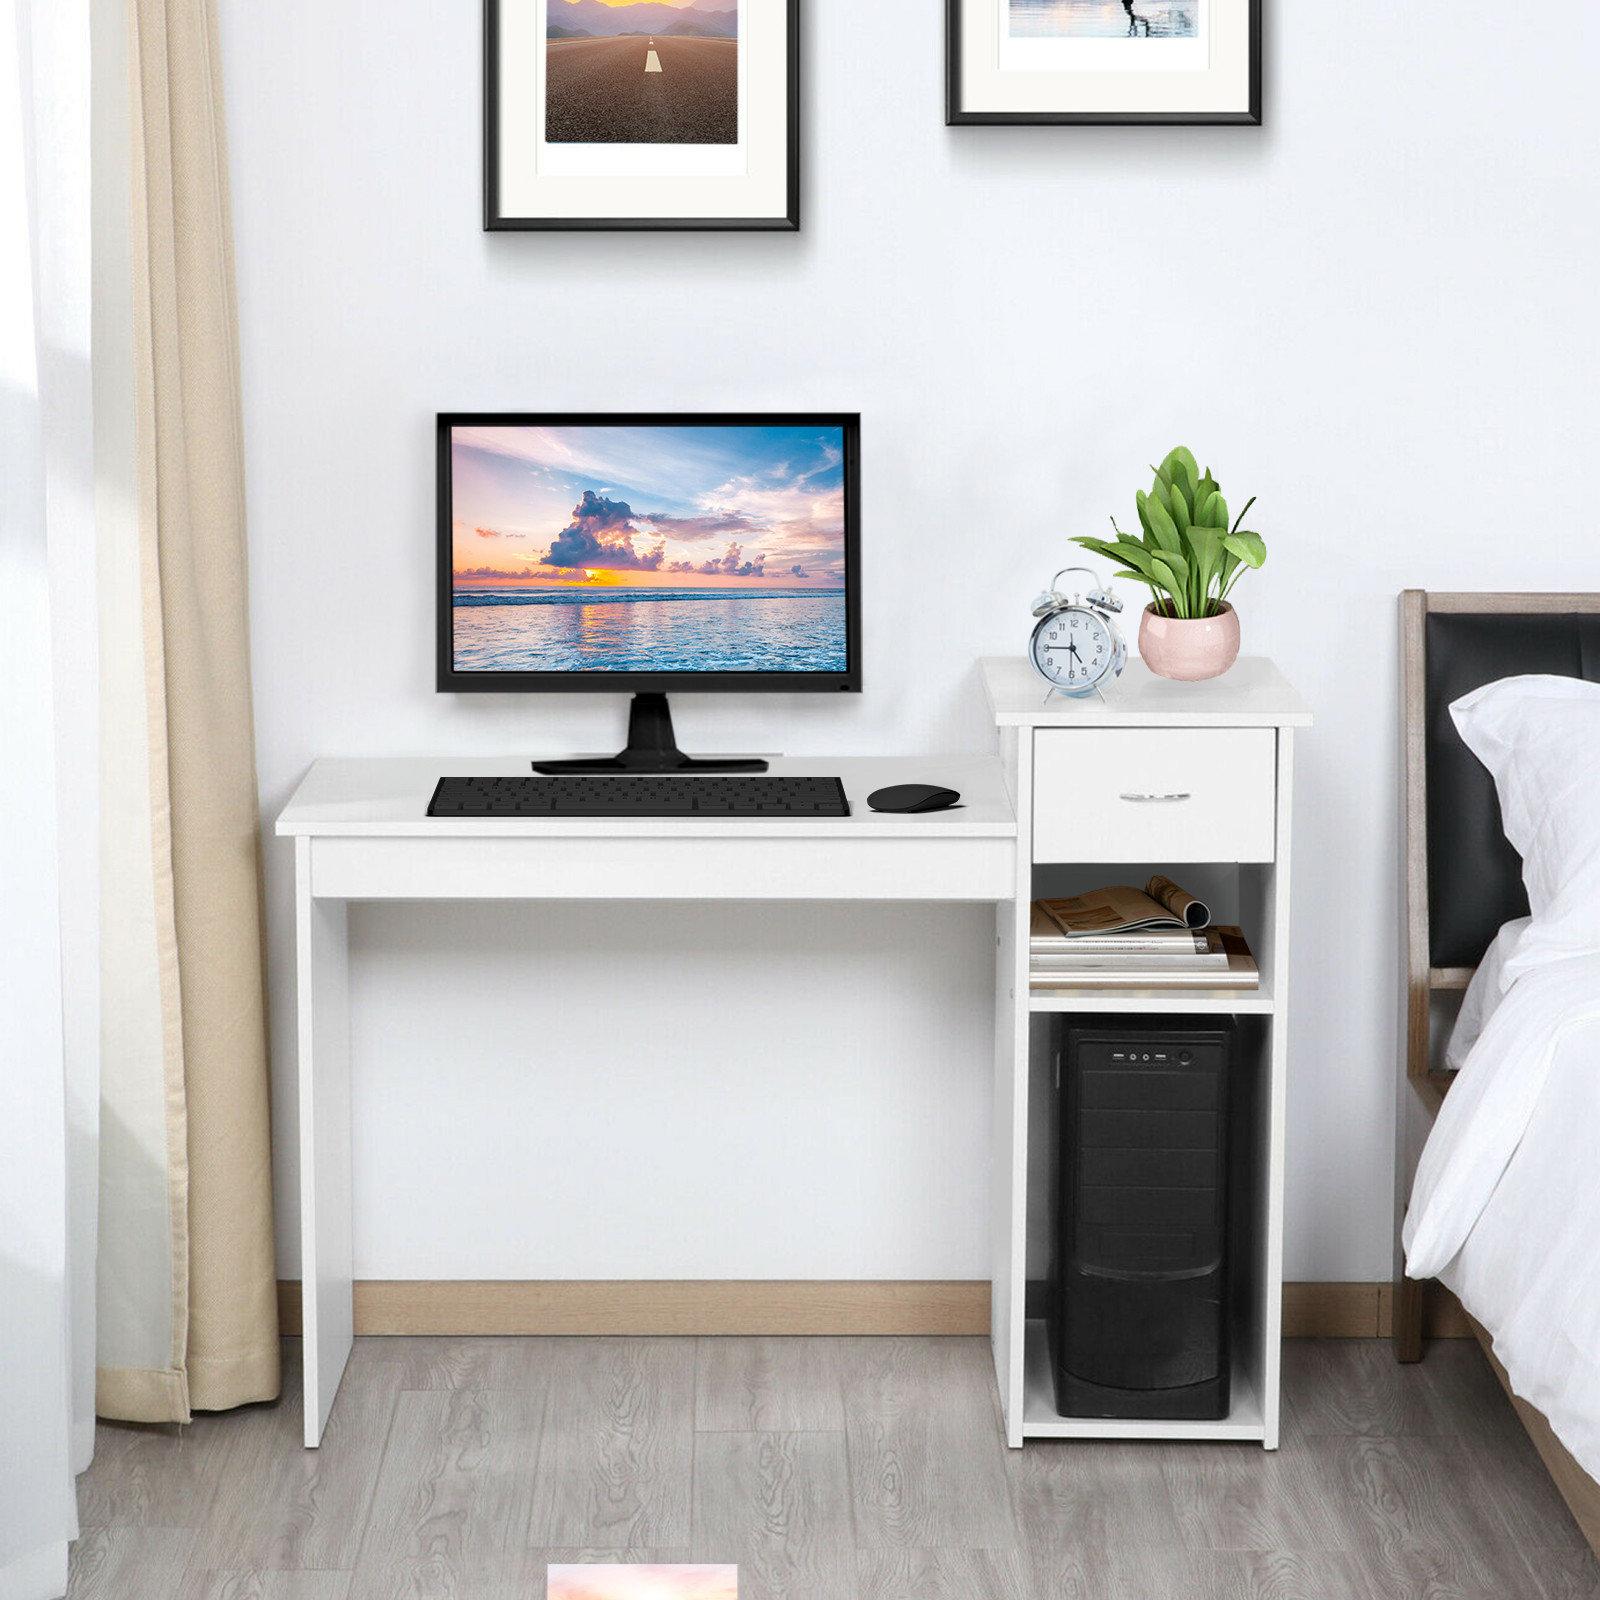 Ebern Designs Home Desktop Computer Desk With Drawers Home Small Desk Dormitory Study Desk Wayfair